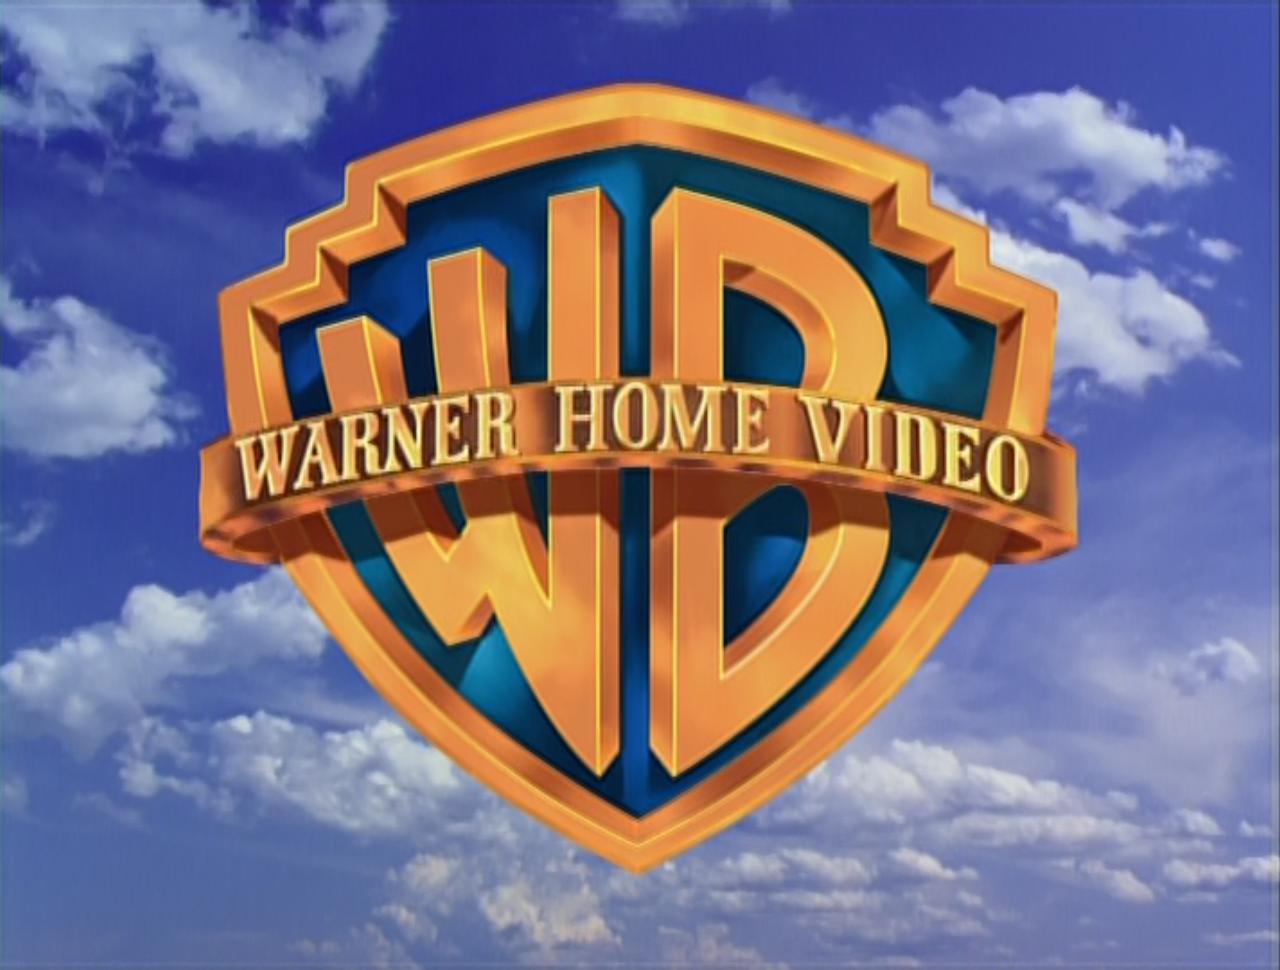 Warner Home Video Image Warner Home Video Png Scoobypedia The Scooby Doo Database Warner Bros Logo Warner Bros Bros